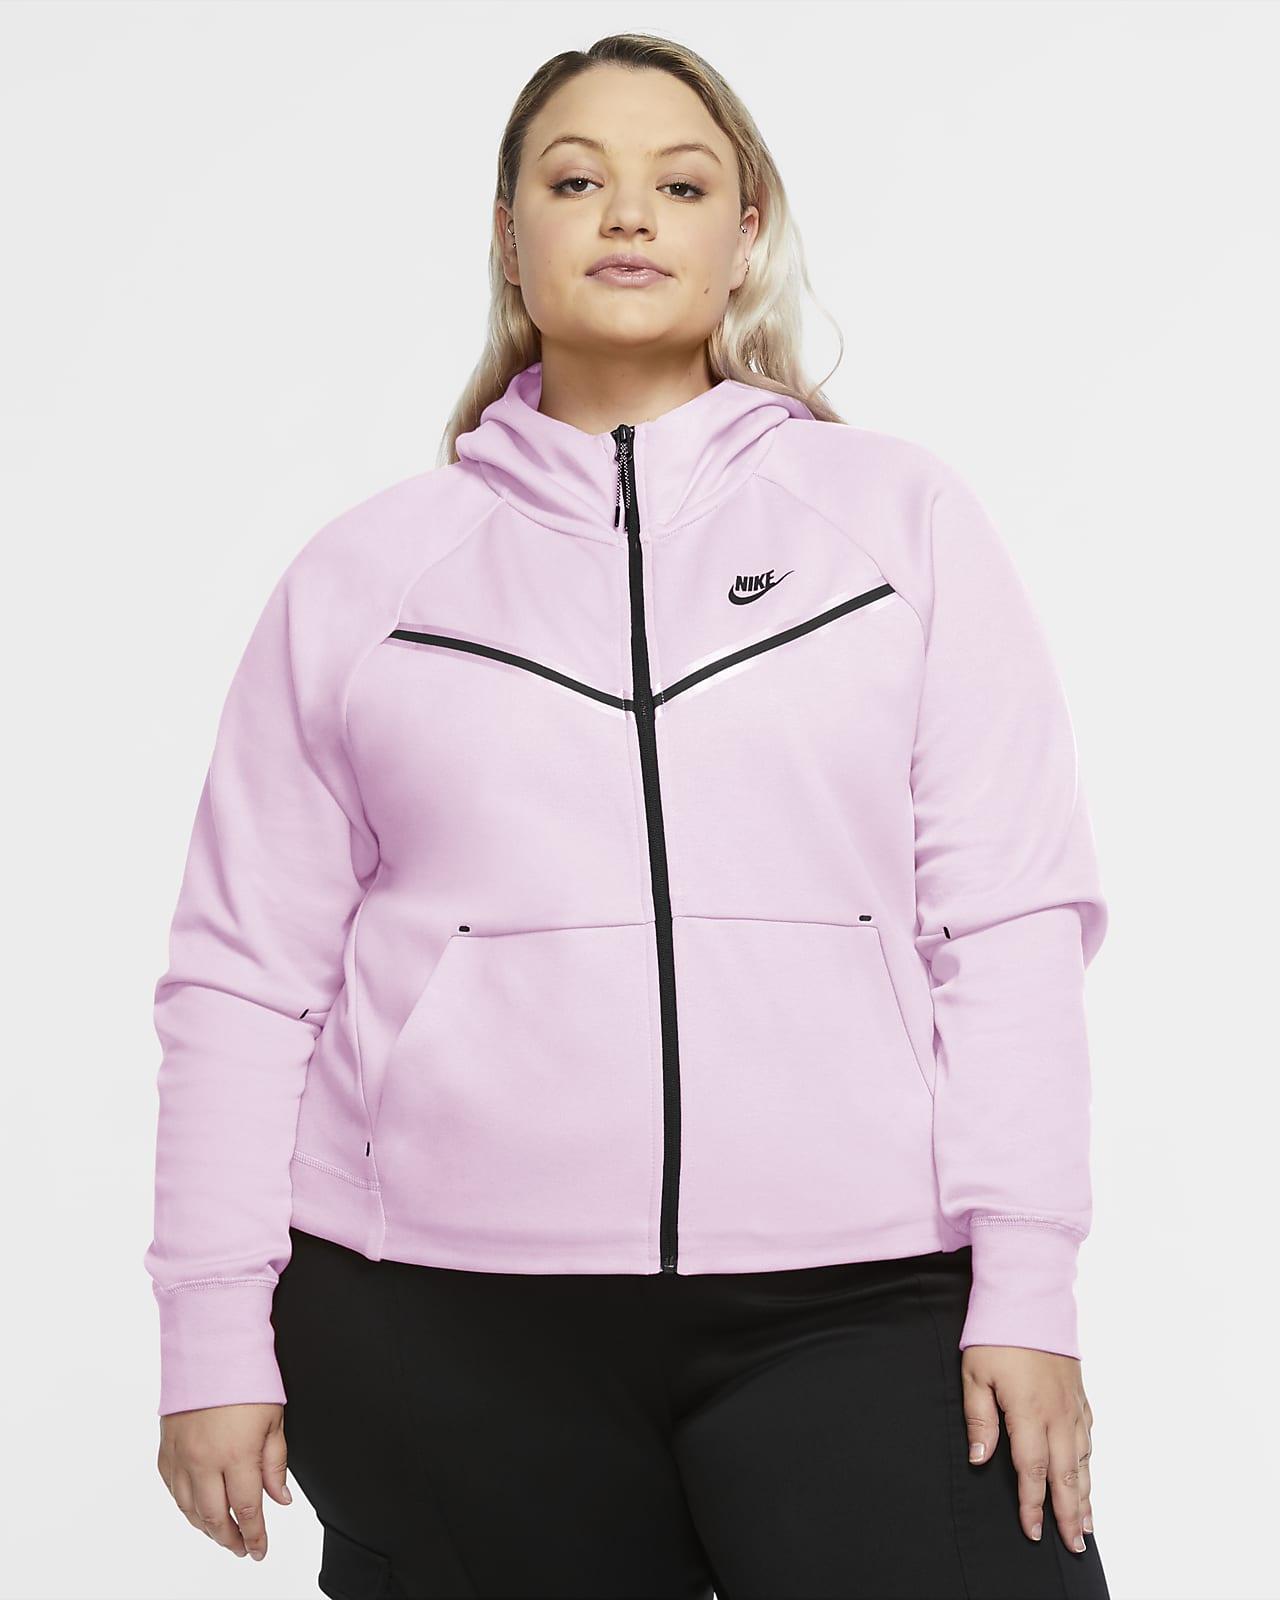 Sudadera con capucha de cierre completo para mujer talla grande Nike Sportswear Tech Fleece Windrunner